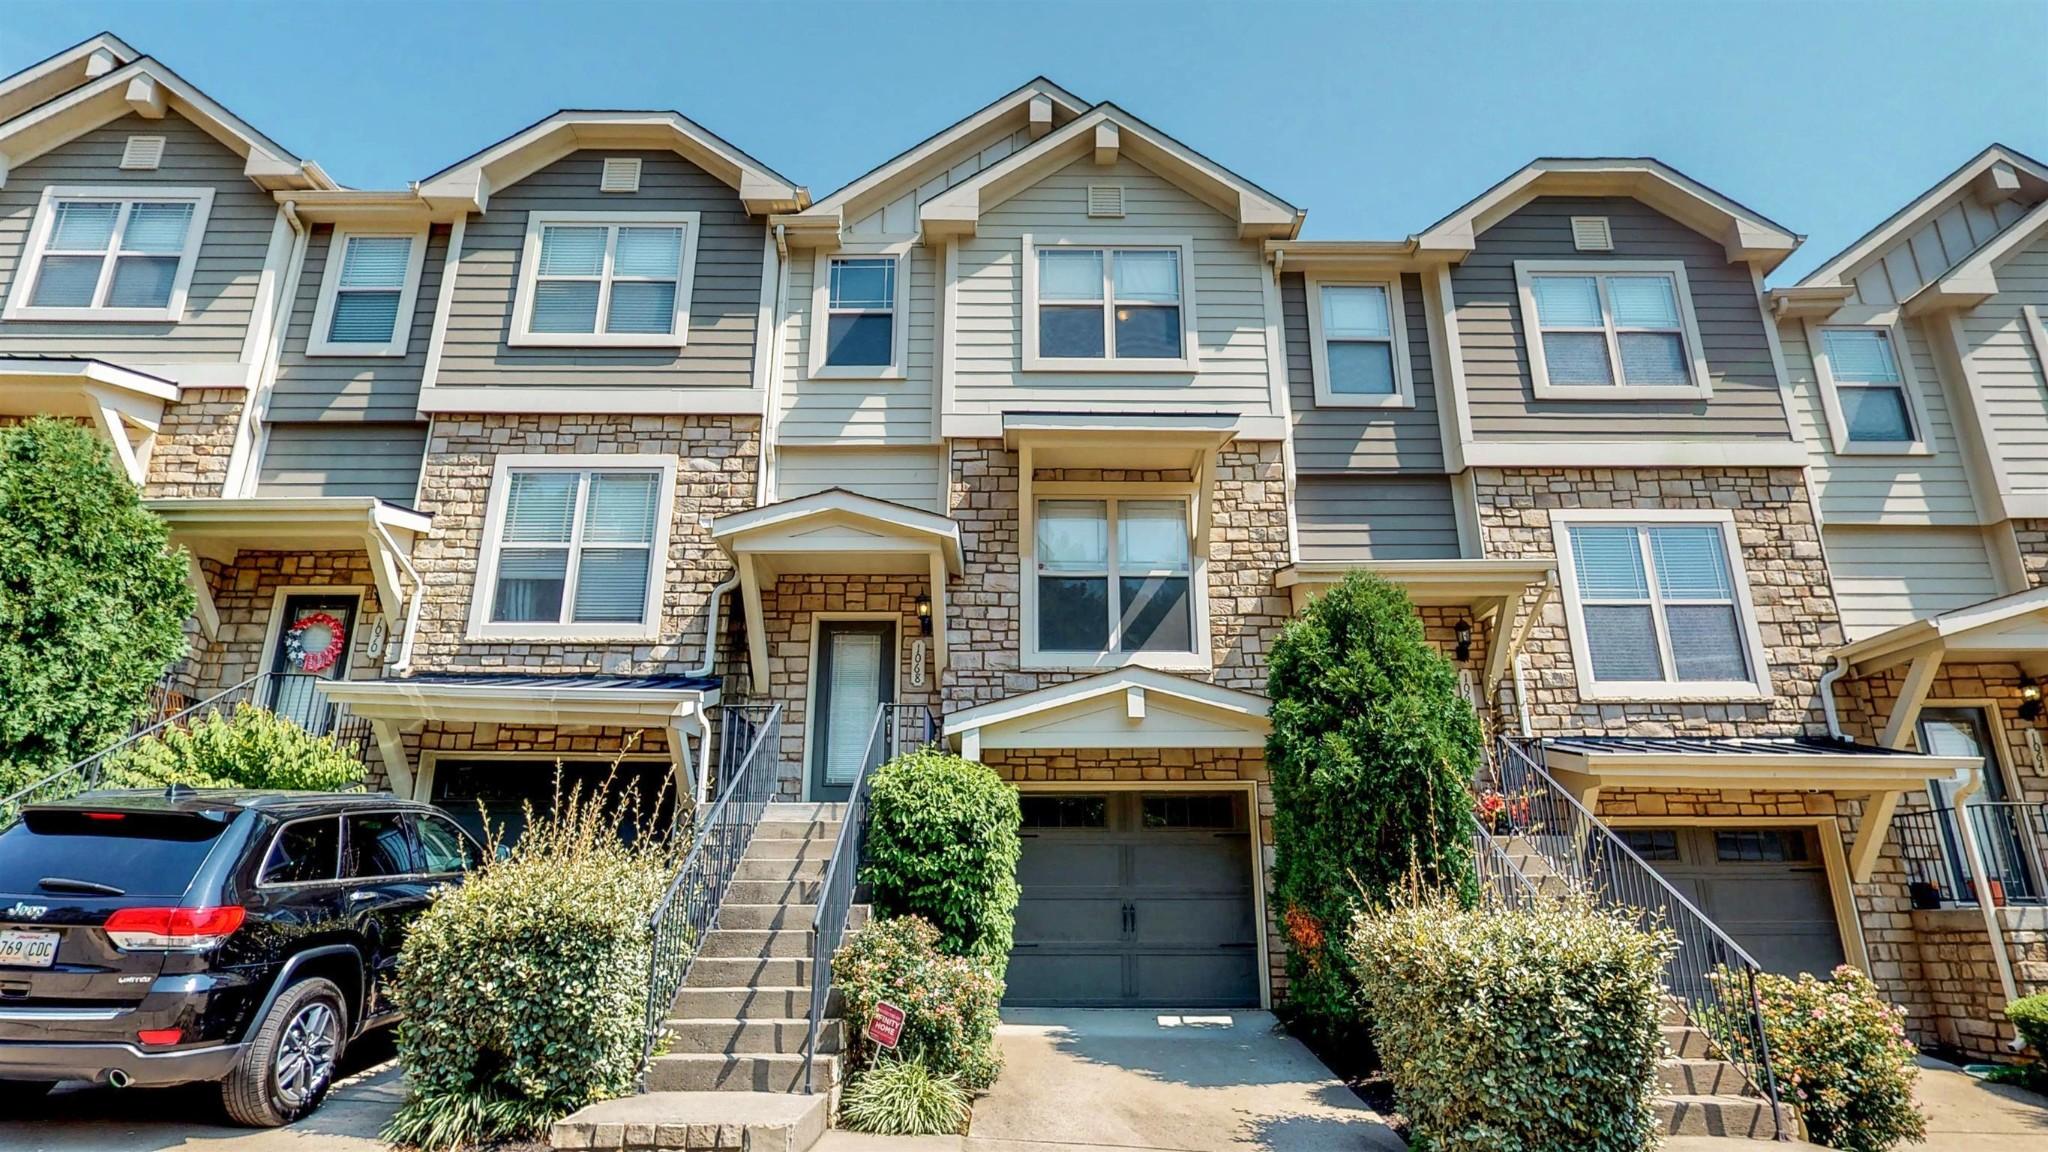 1068 Woodbury Falls Dr, Nashville, TN 37221 - Nashville, TN real estate listing